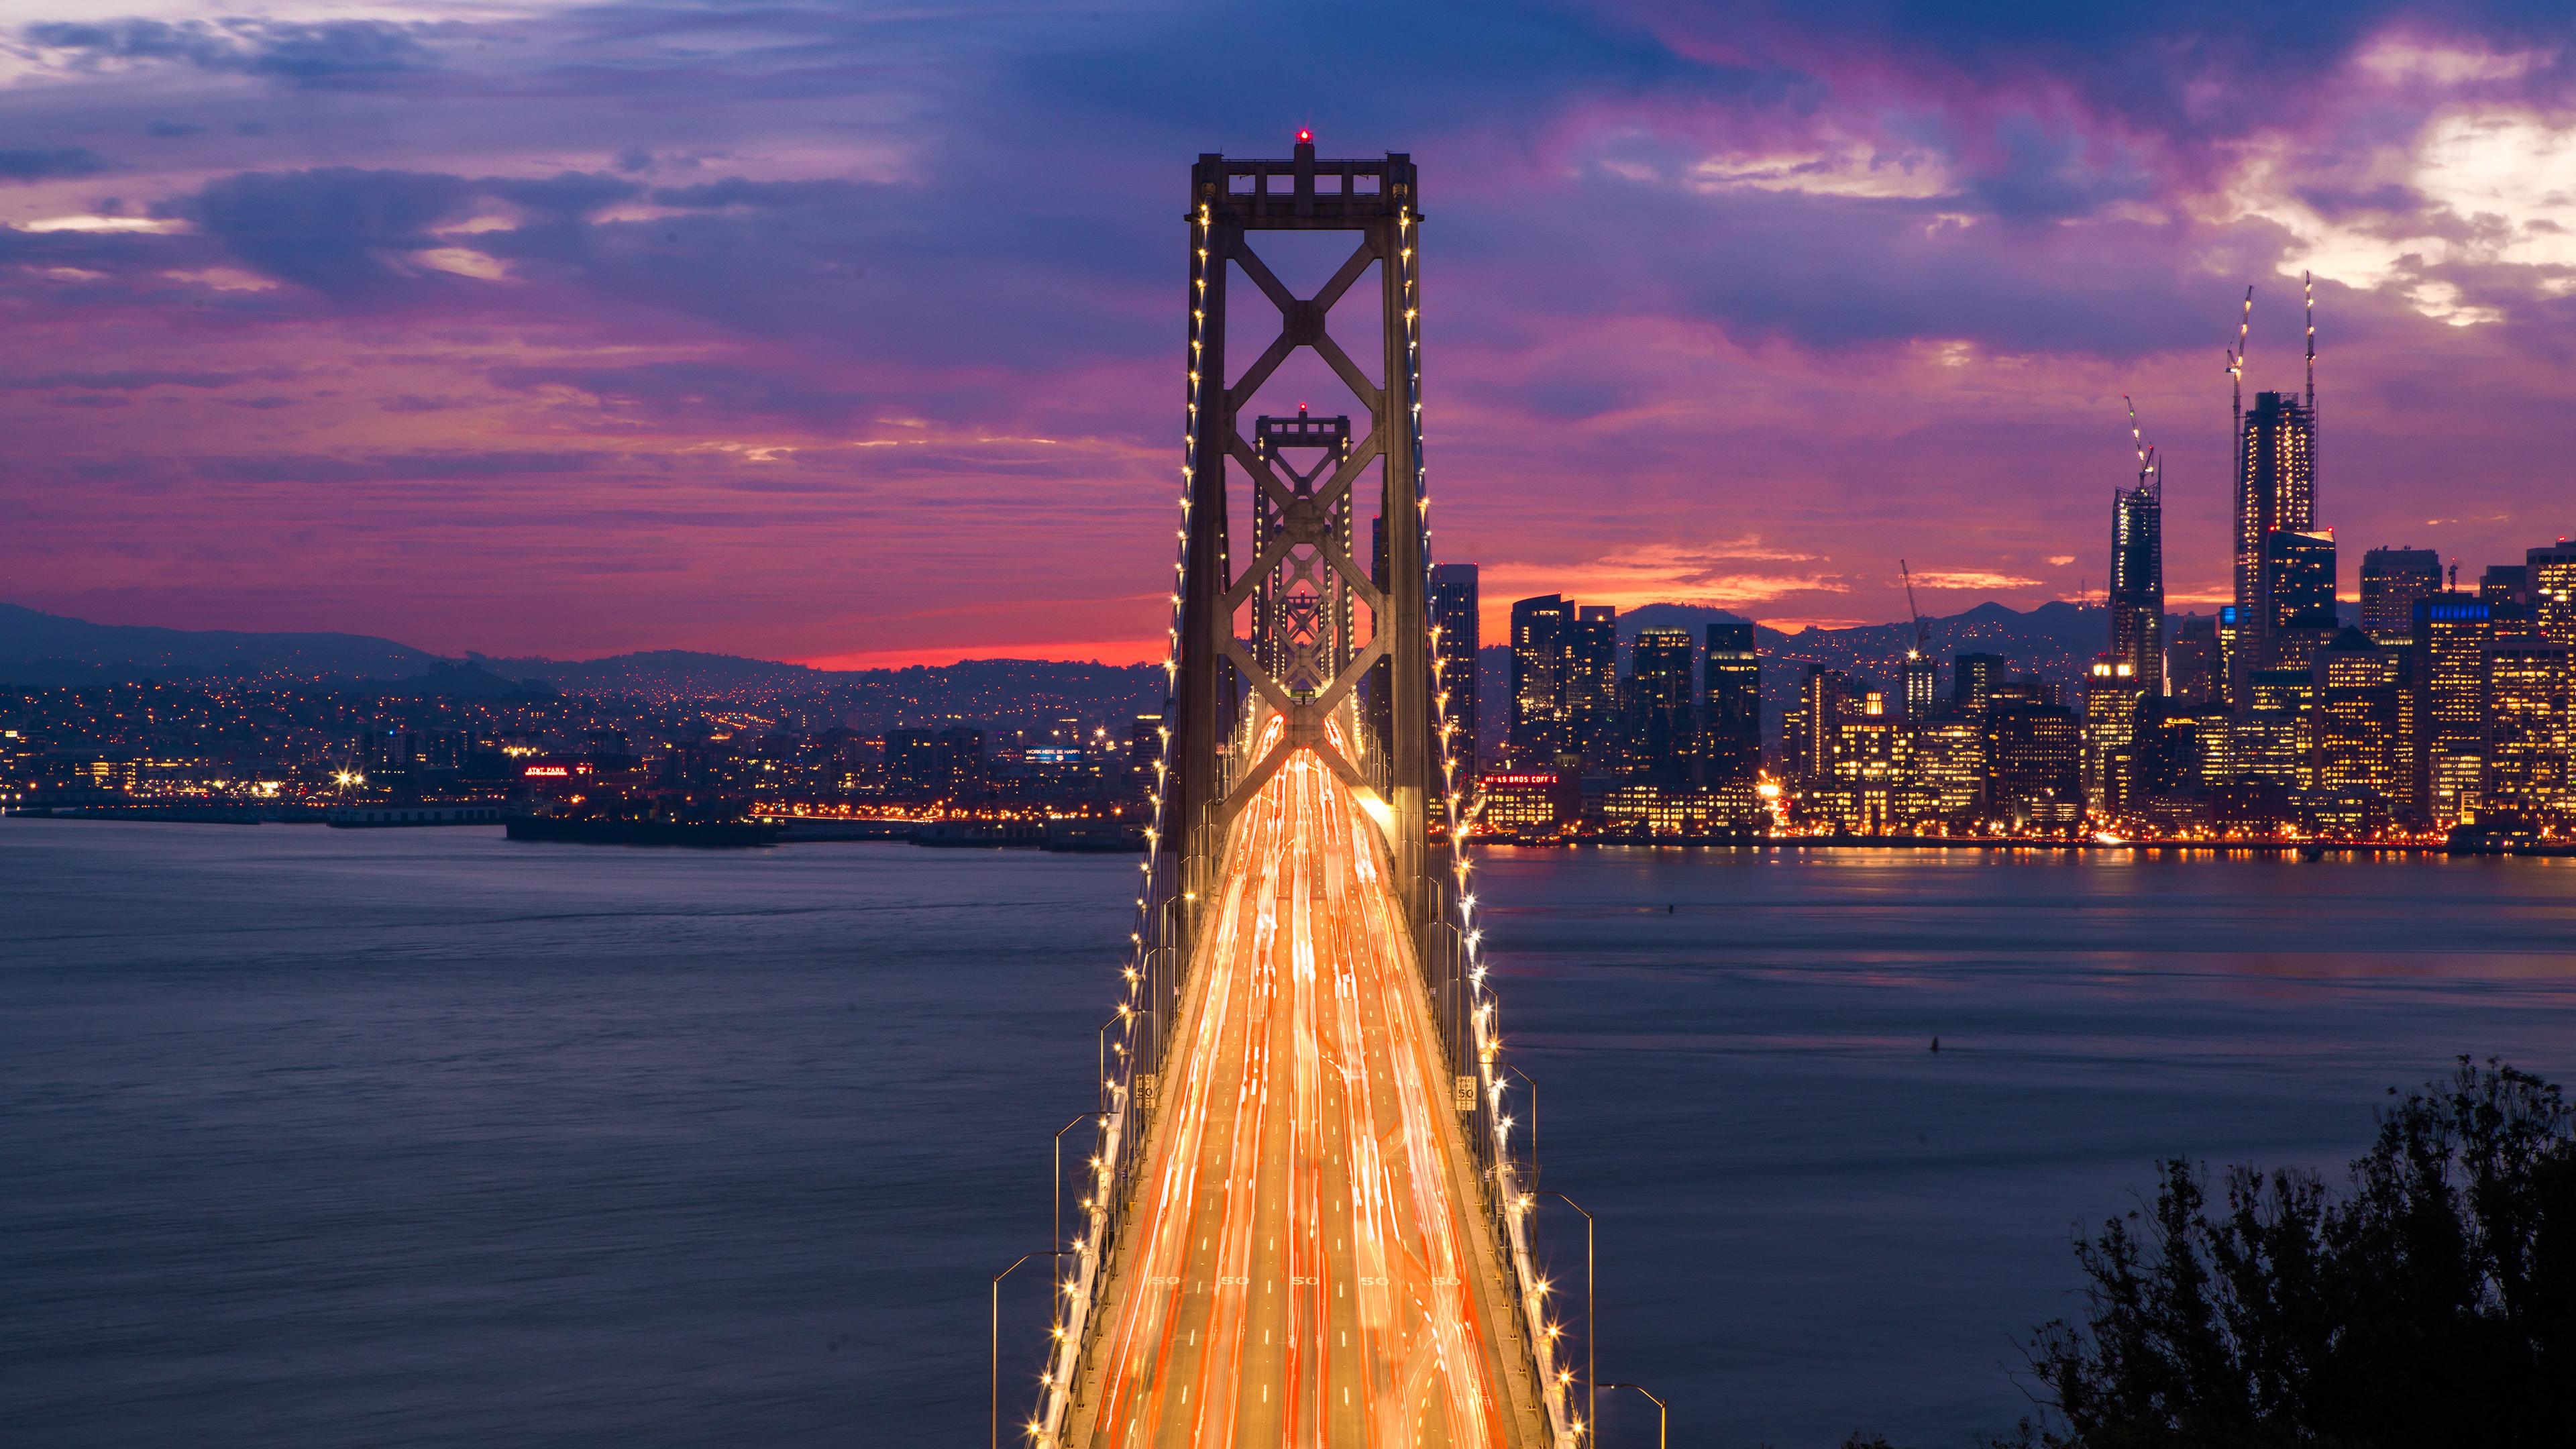 General 3840x2160 architecture cityscape skyscraper evening sunset water bridge clouds city lights motion blur San Francisco USA light trails San Francisco-Oakland Bay Bridge city purple sky